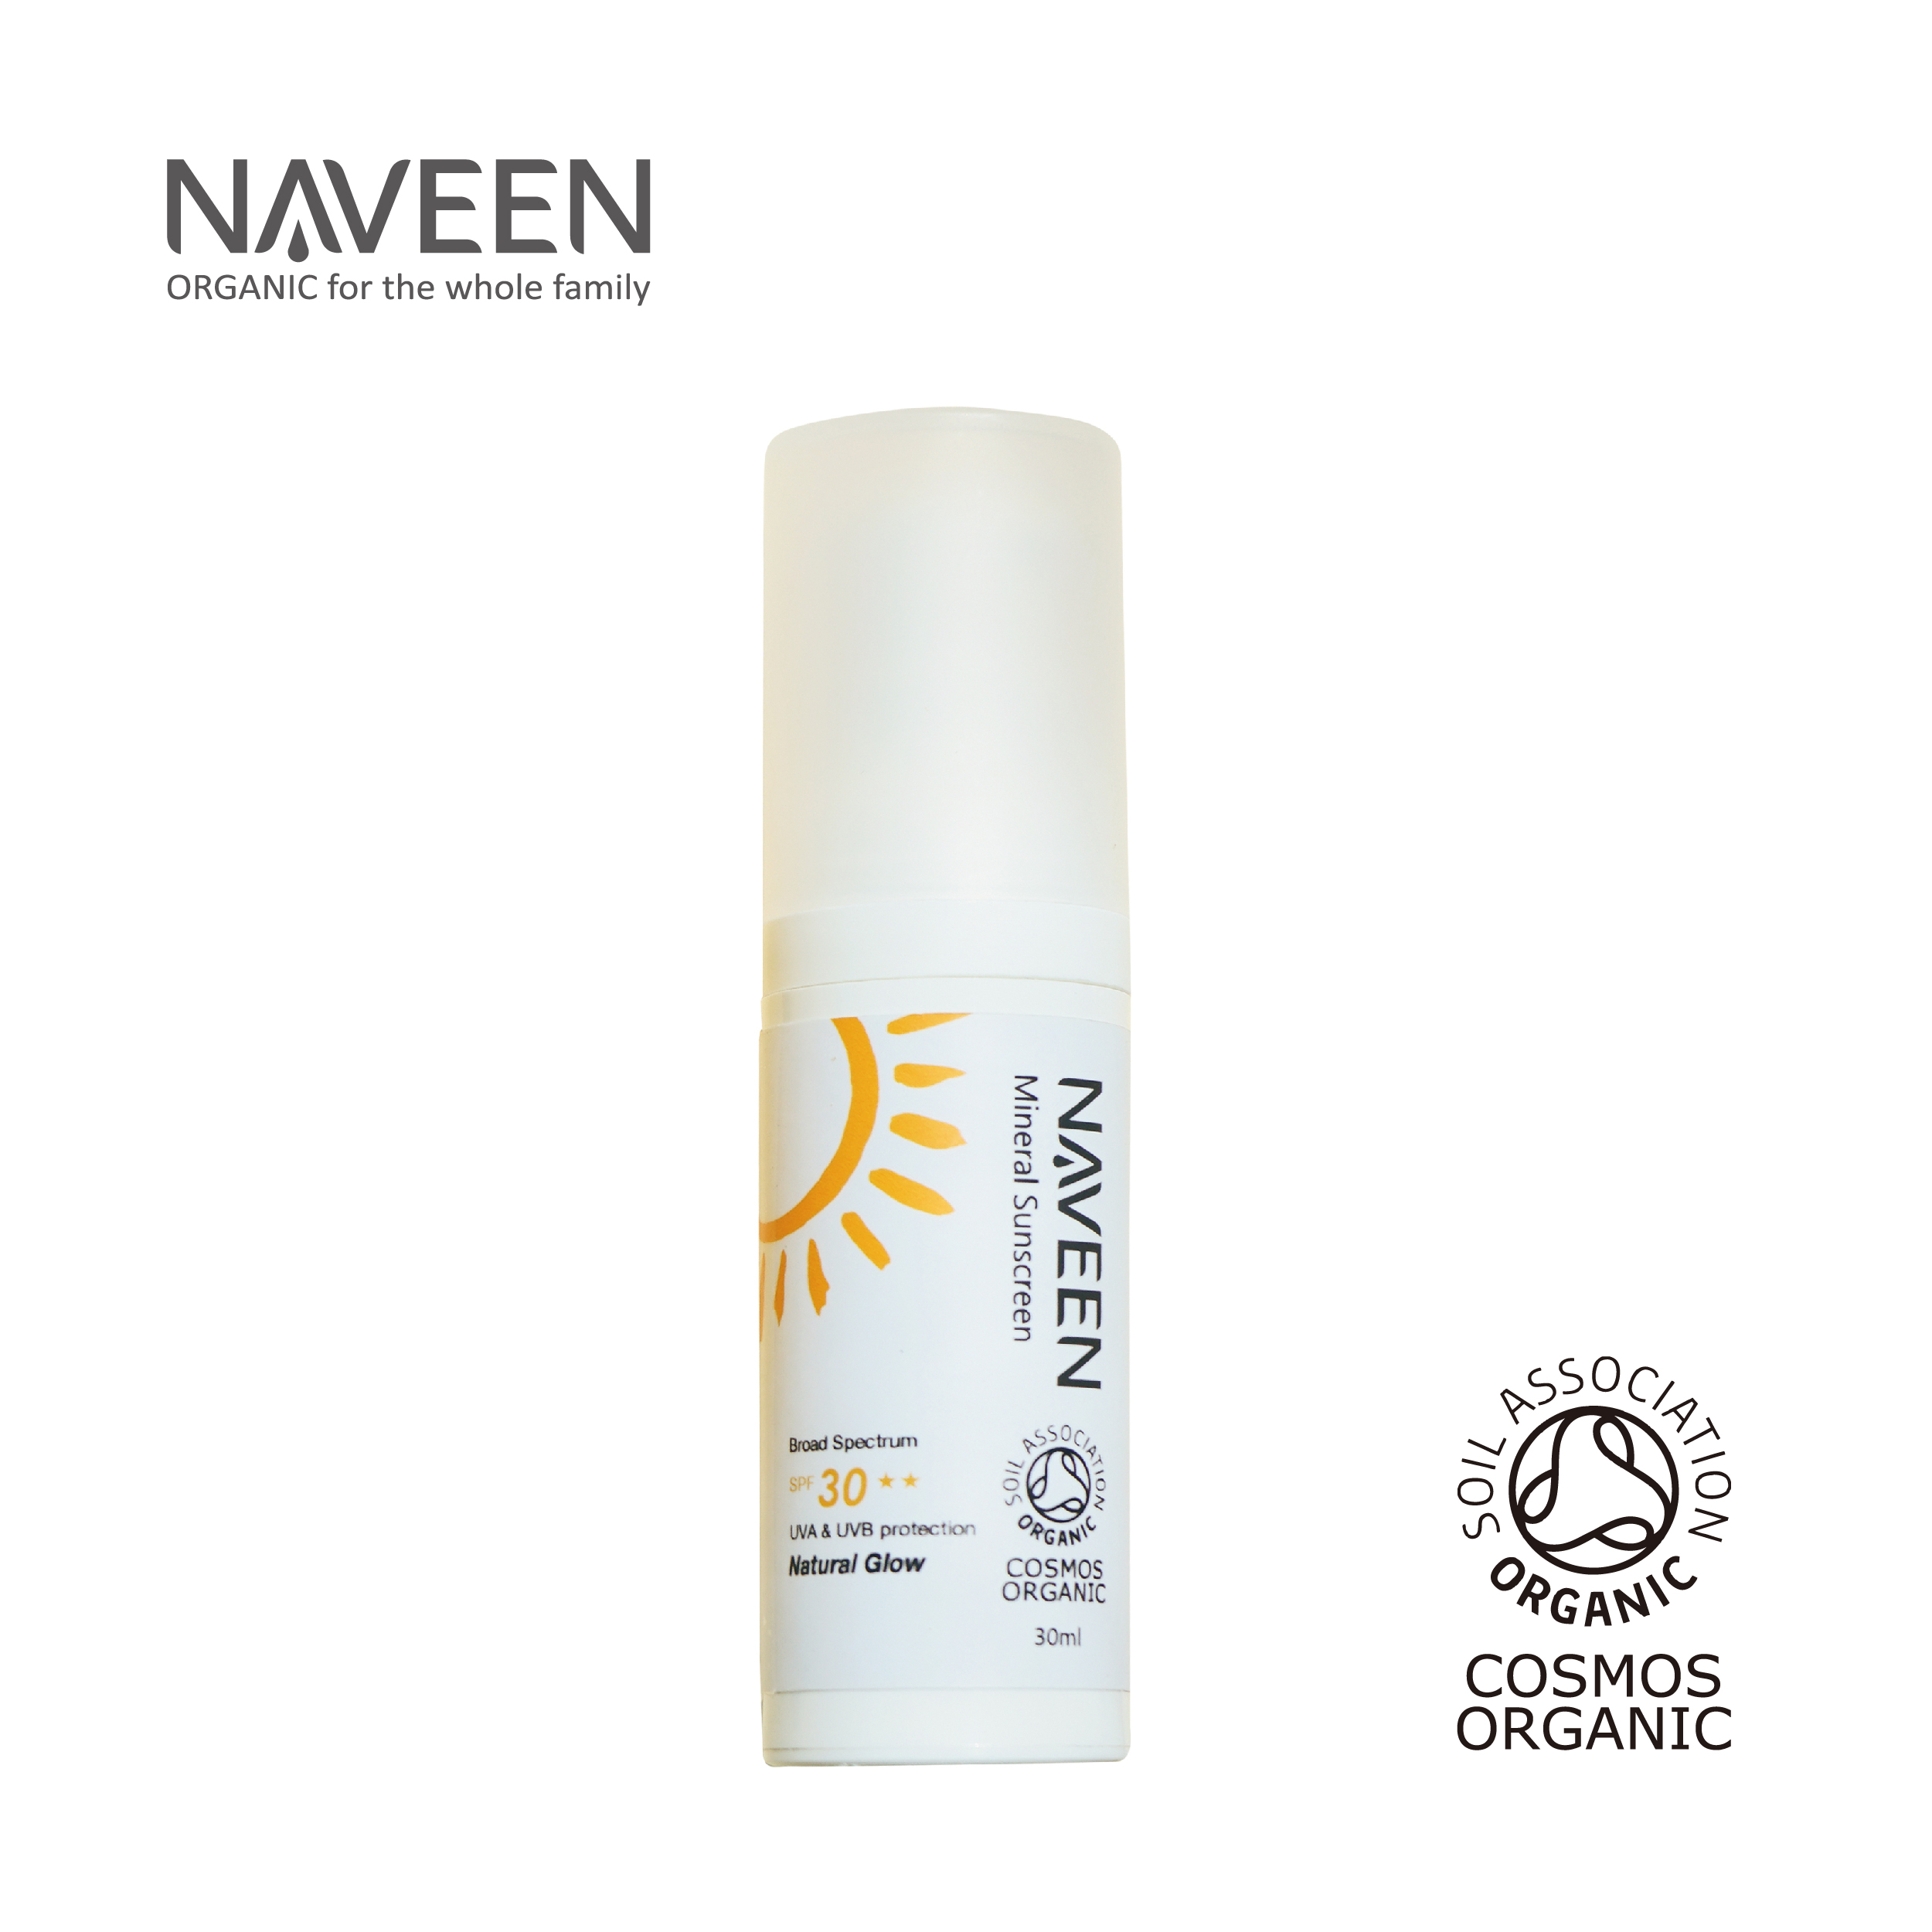 Naveen 清亮物理防晒乳(白色) 30ml